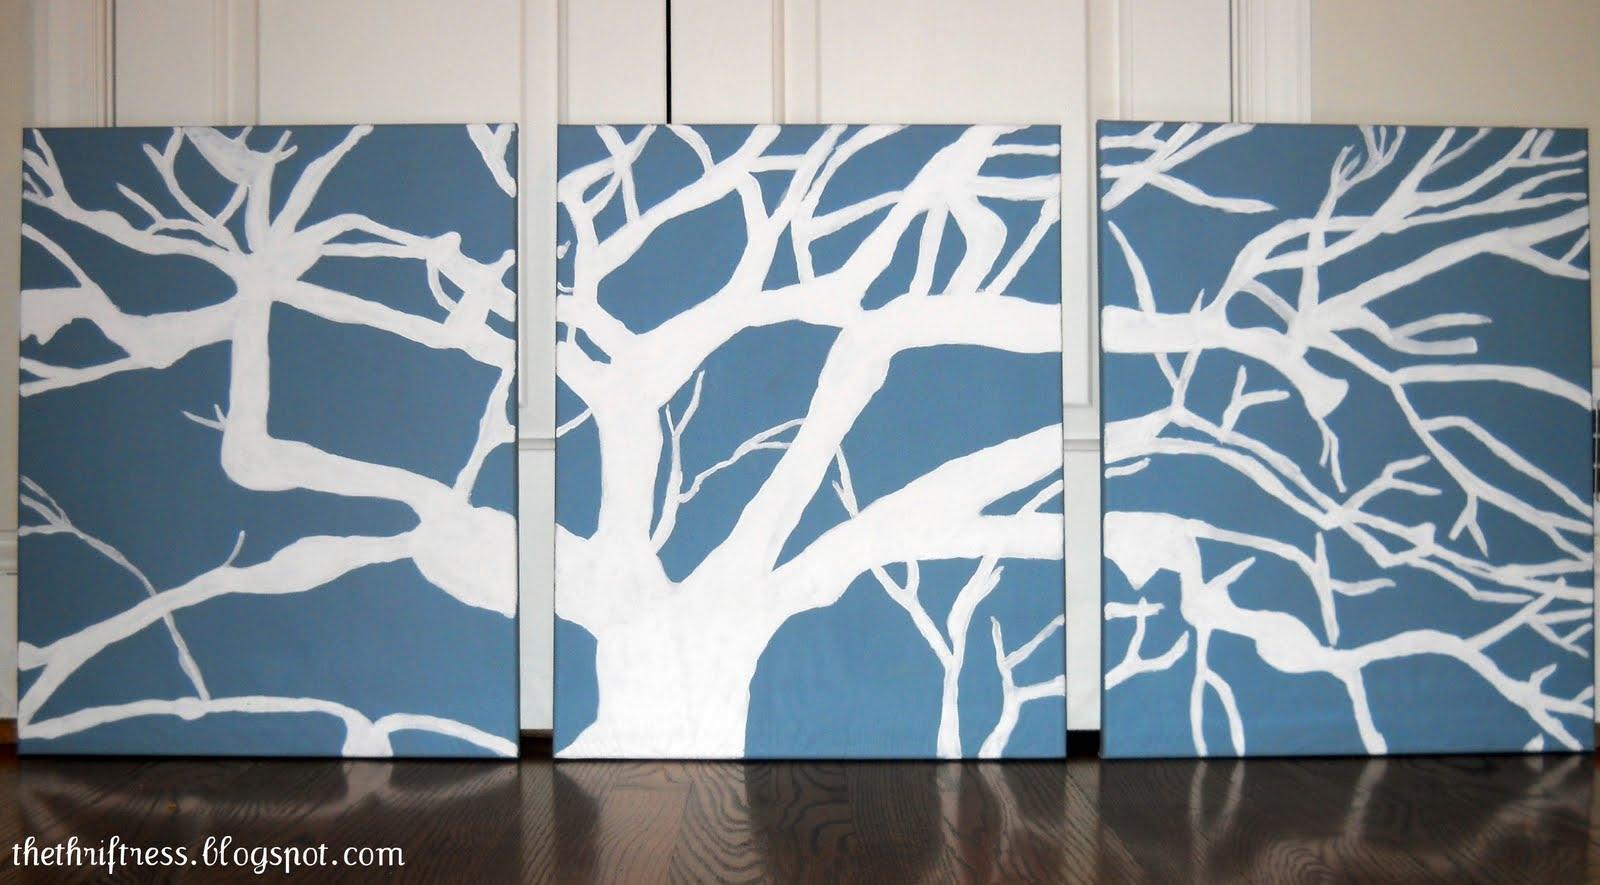 Diy Wall Art Stencils Paint Fabric - Dma Homes | #37854 inside Newest Large Fabric Wall Art